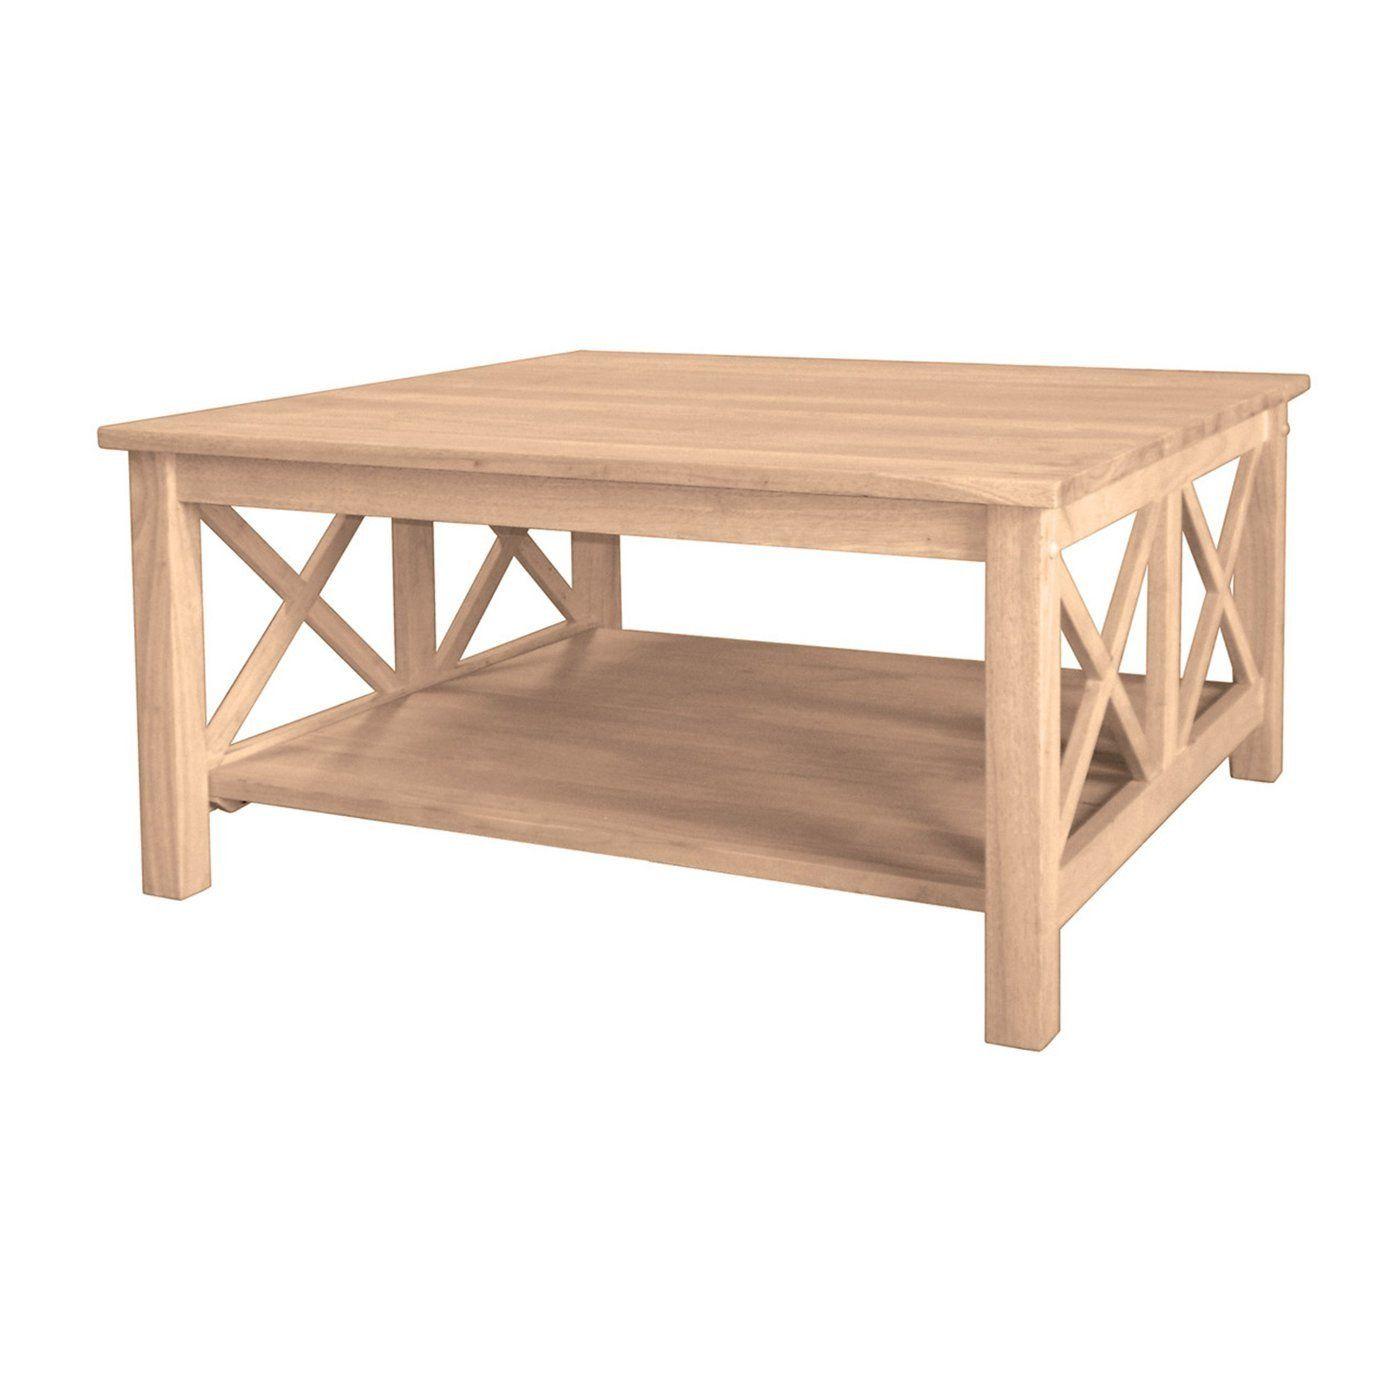 "Hampton Square Hardwood Coffee Table 36"" Finished Options"